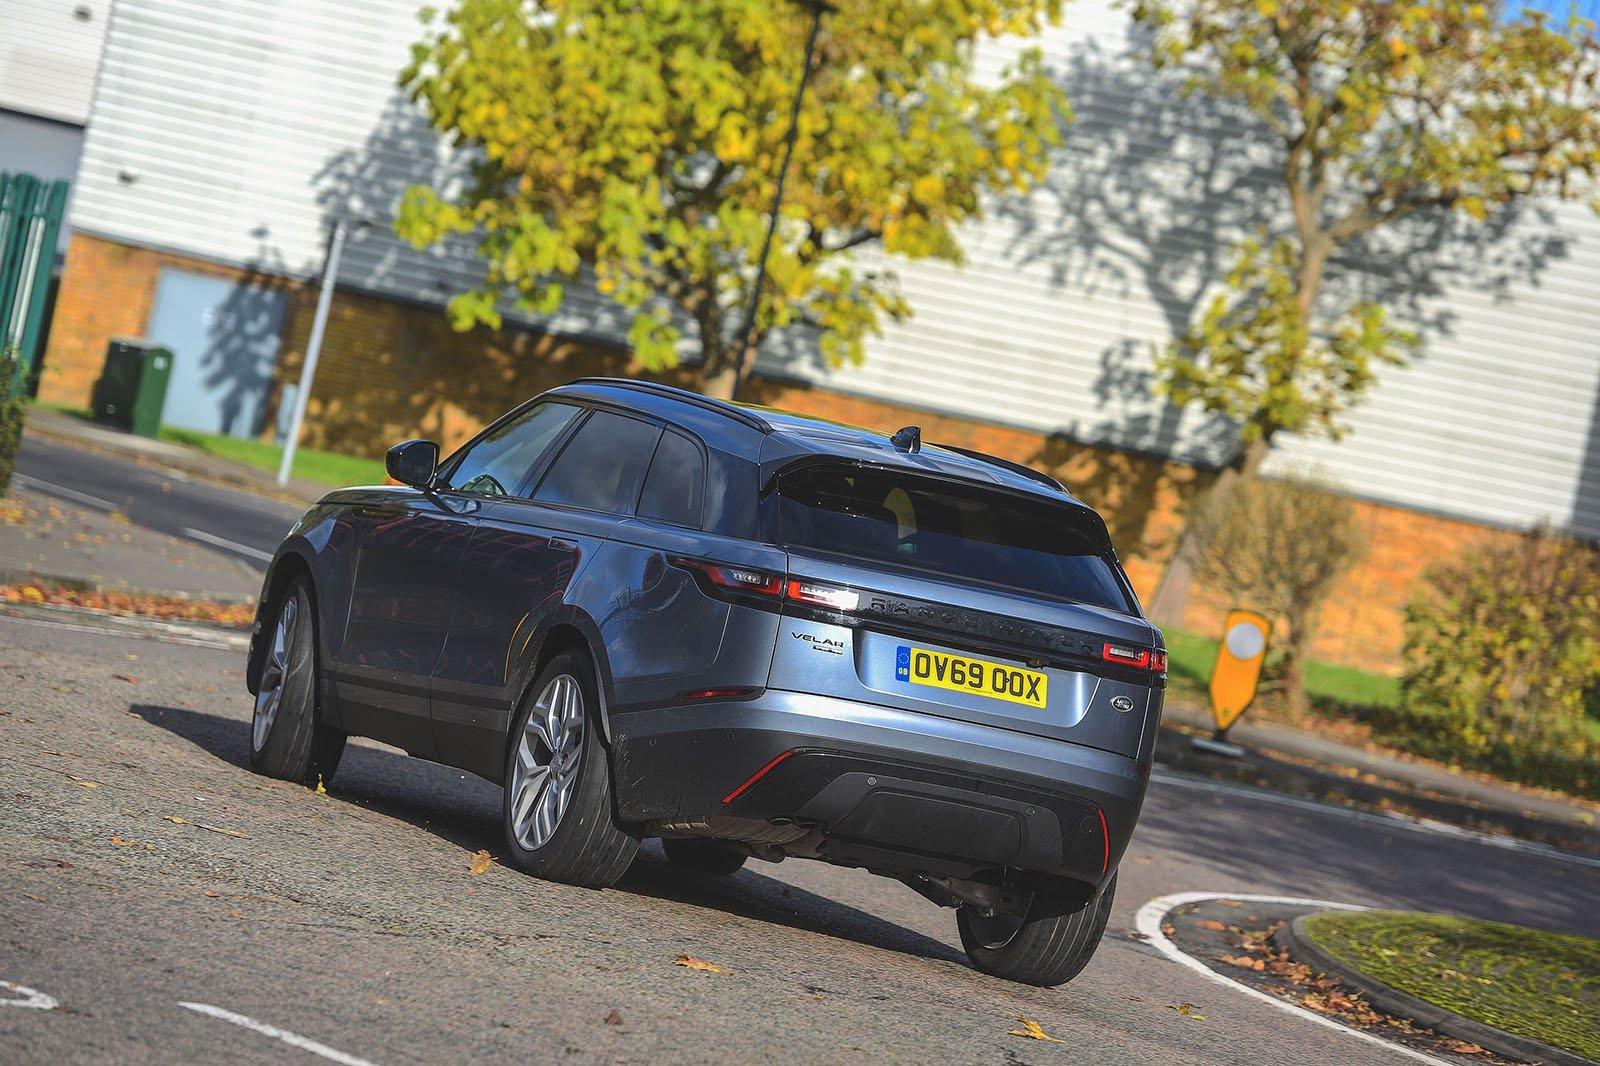 2019 Range Rover Velar D180 R-Dynamic SE rear three-quarters